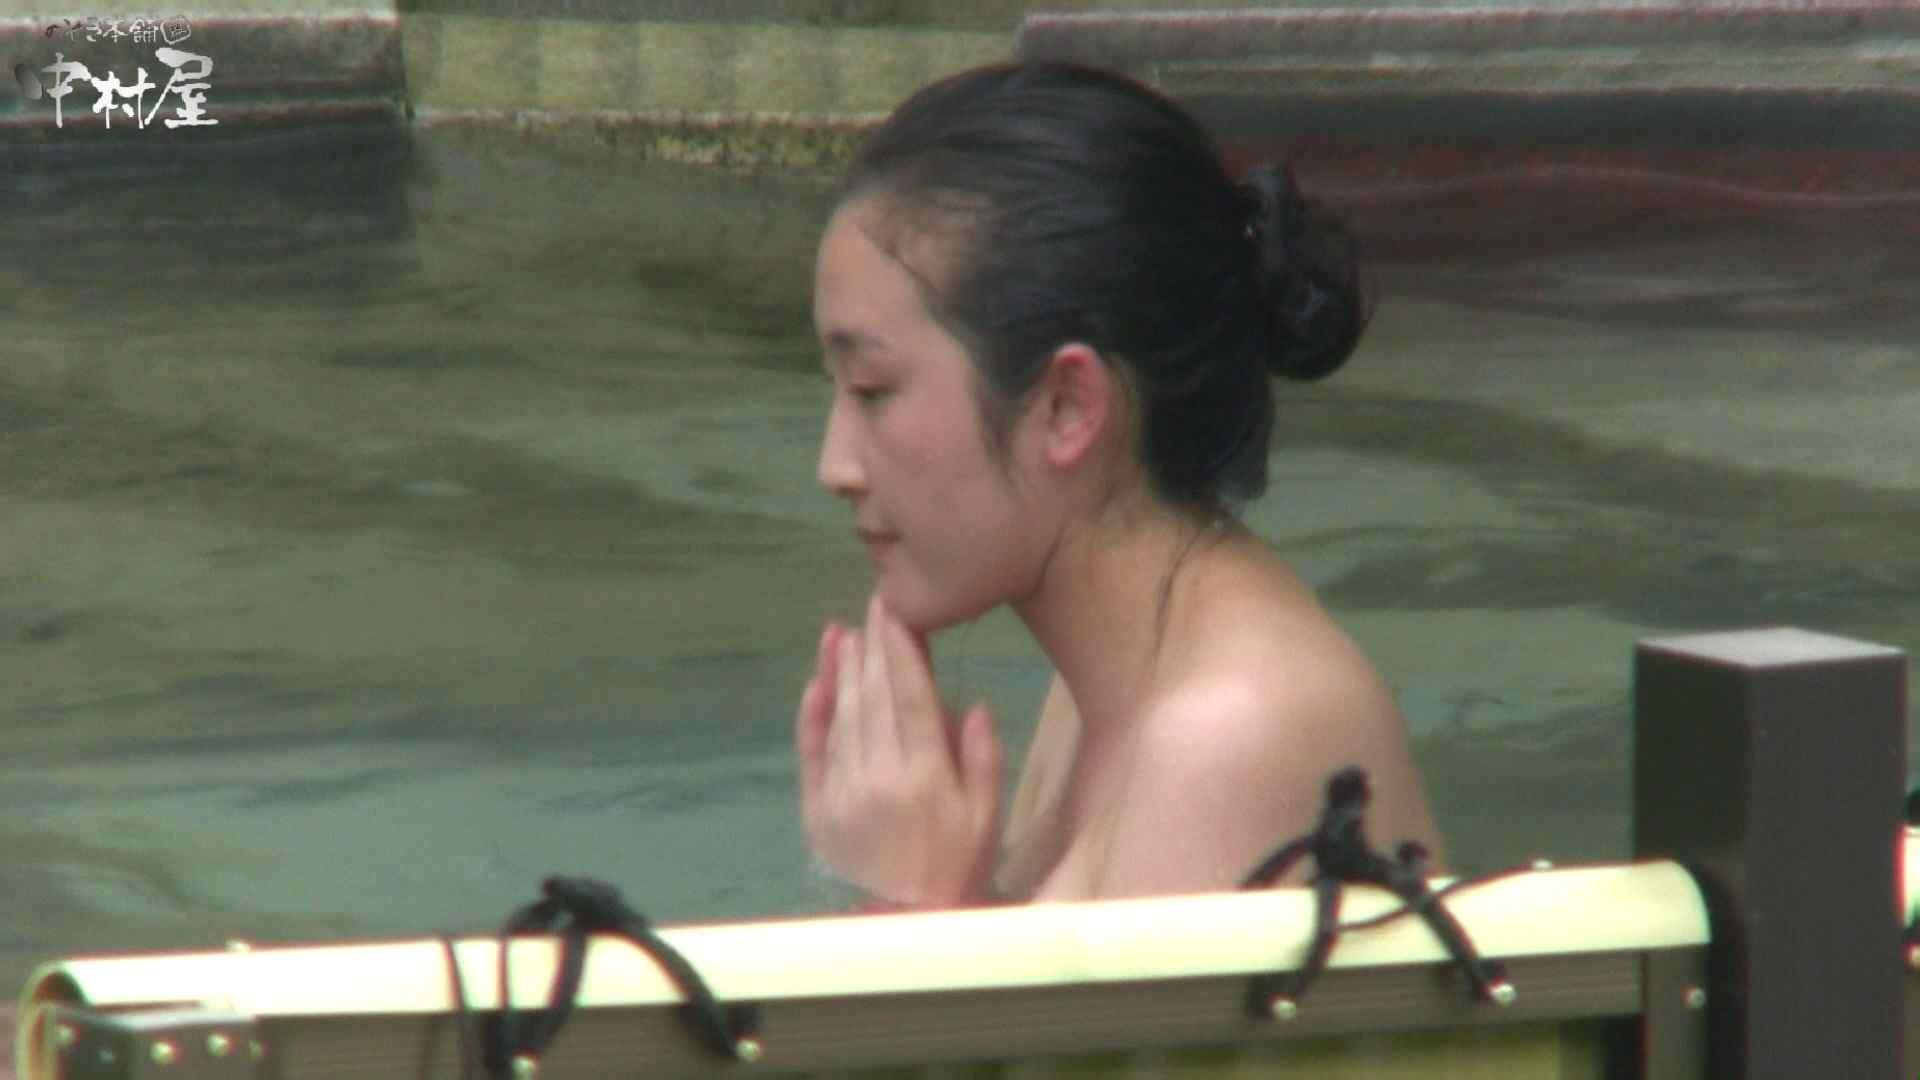 Aquaな露天風呂Vol.949 盗撮   OLセックス  92画像 46